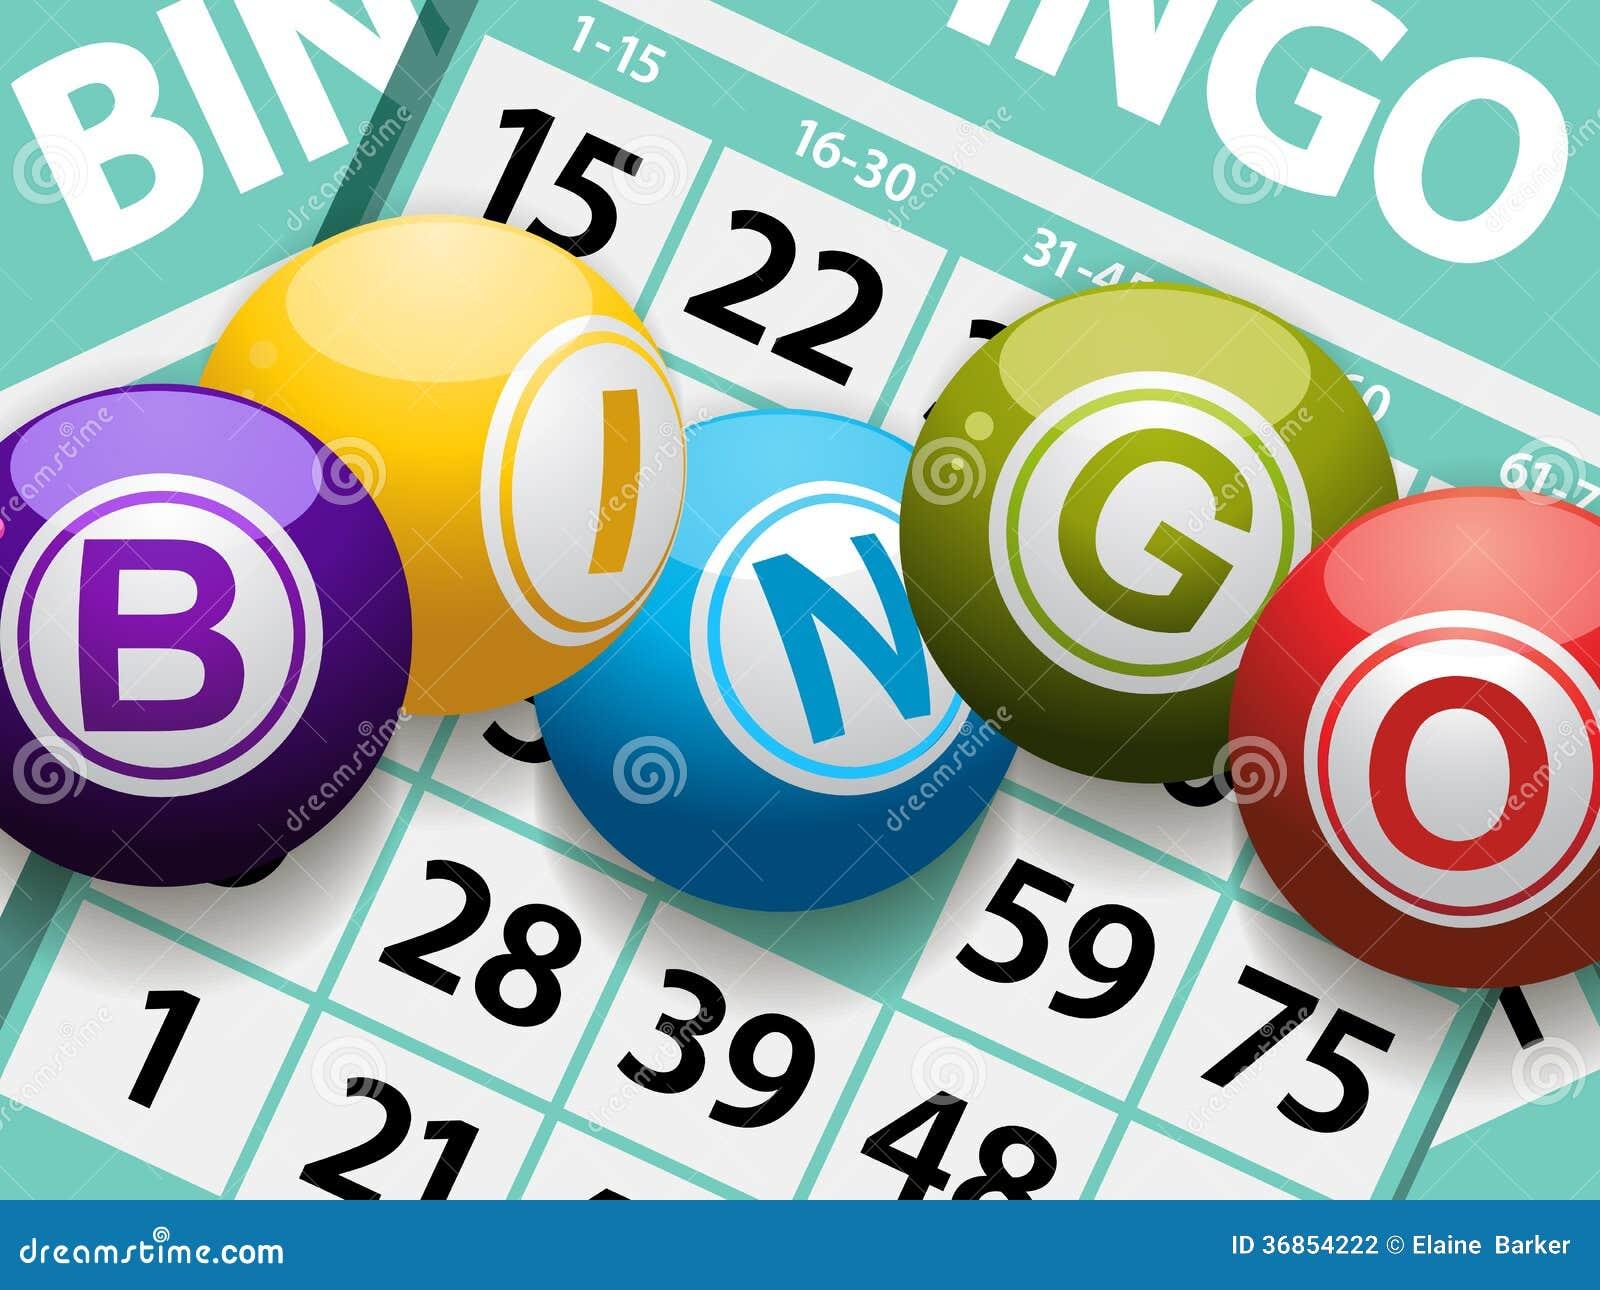 Bingo Cards And Balls Royalty Free Stock Photos - Image: 18143508